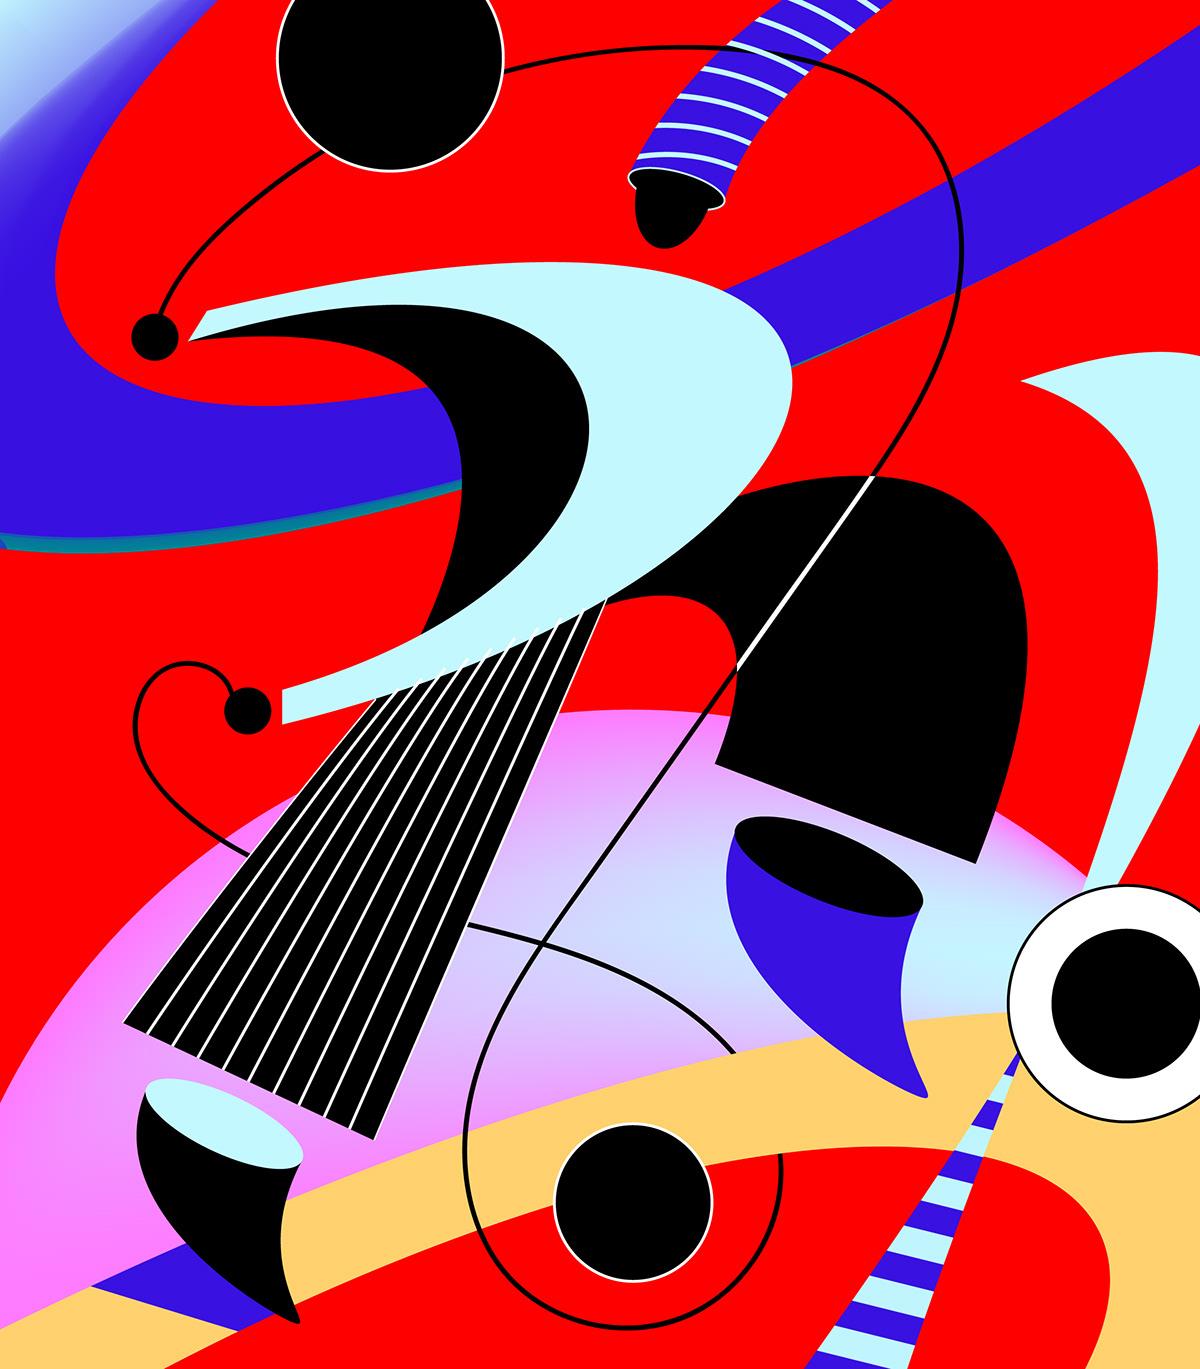 abstract art artwork Character color design flat ILLUSTRATION  minimal vector